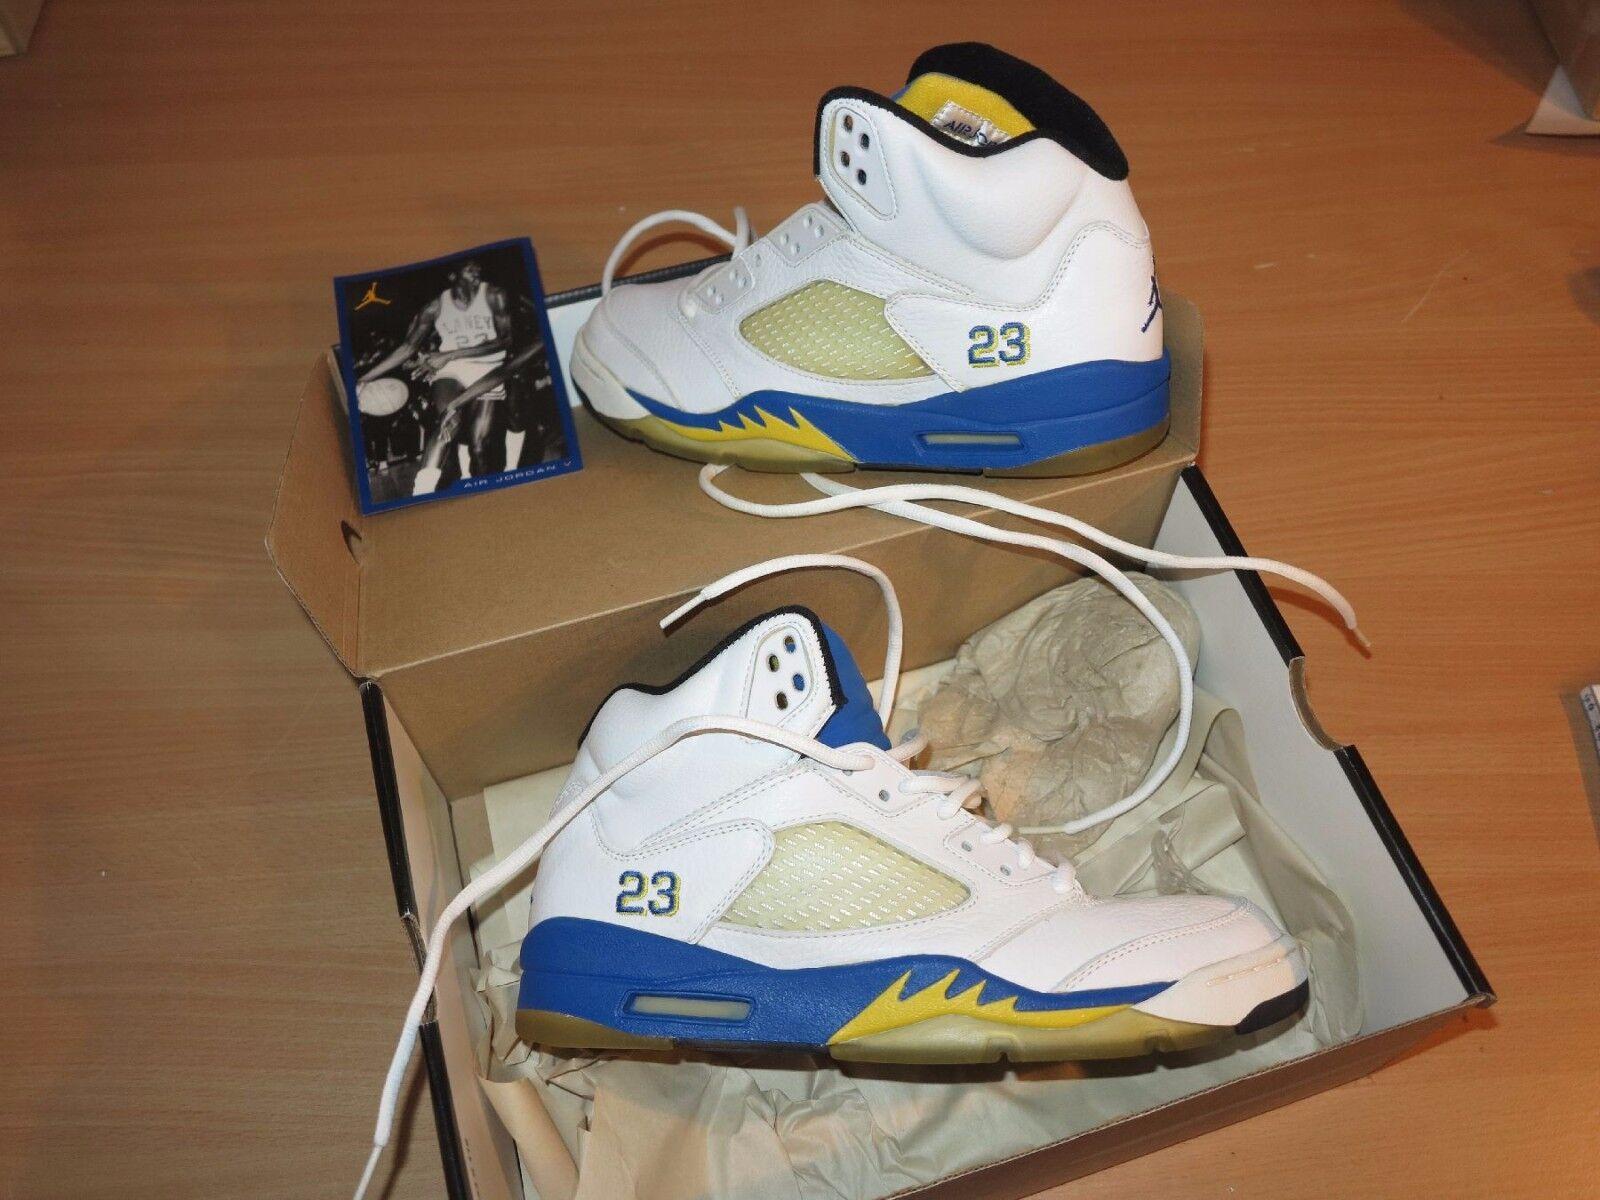 Nike Air Jordan 5 V LANEY BIANCO BLU MAIS 1999 Taglia 9,5/43 NUOVO MENTA RARA